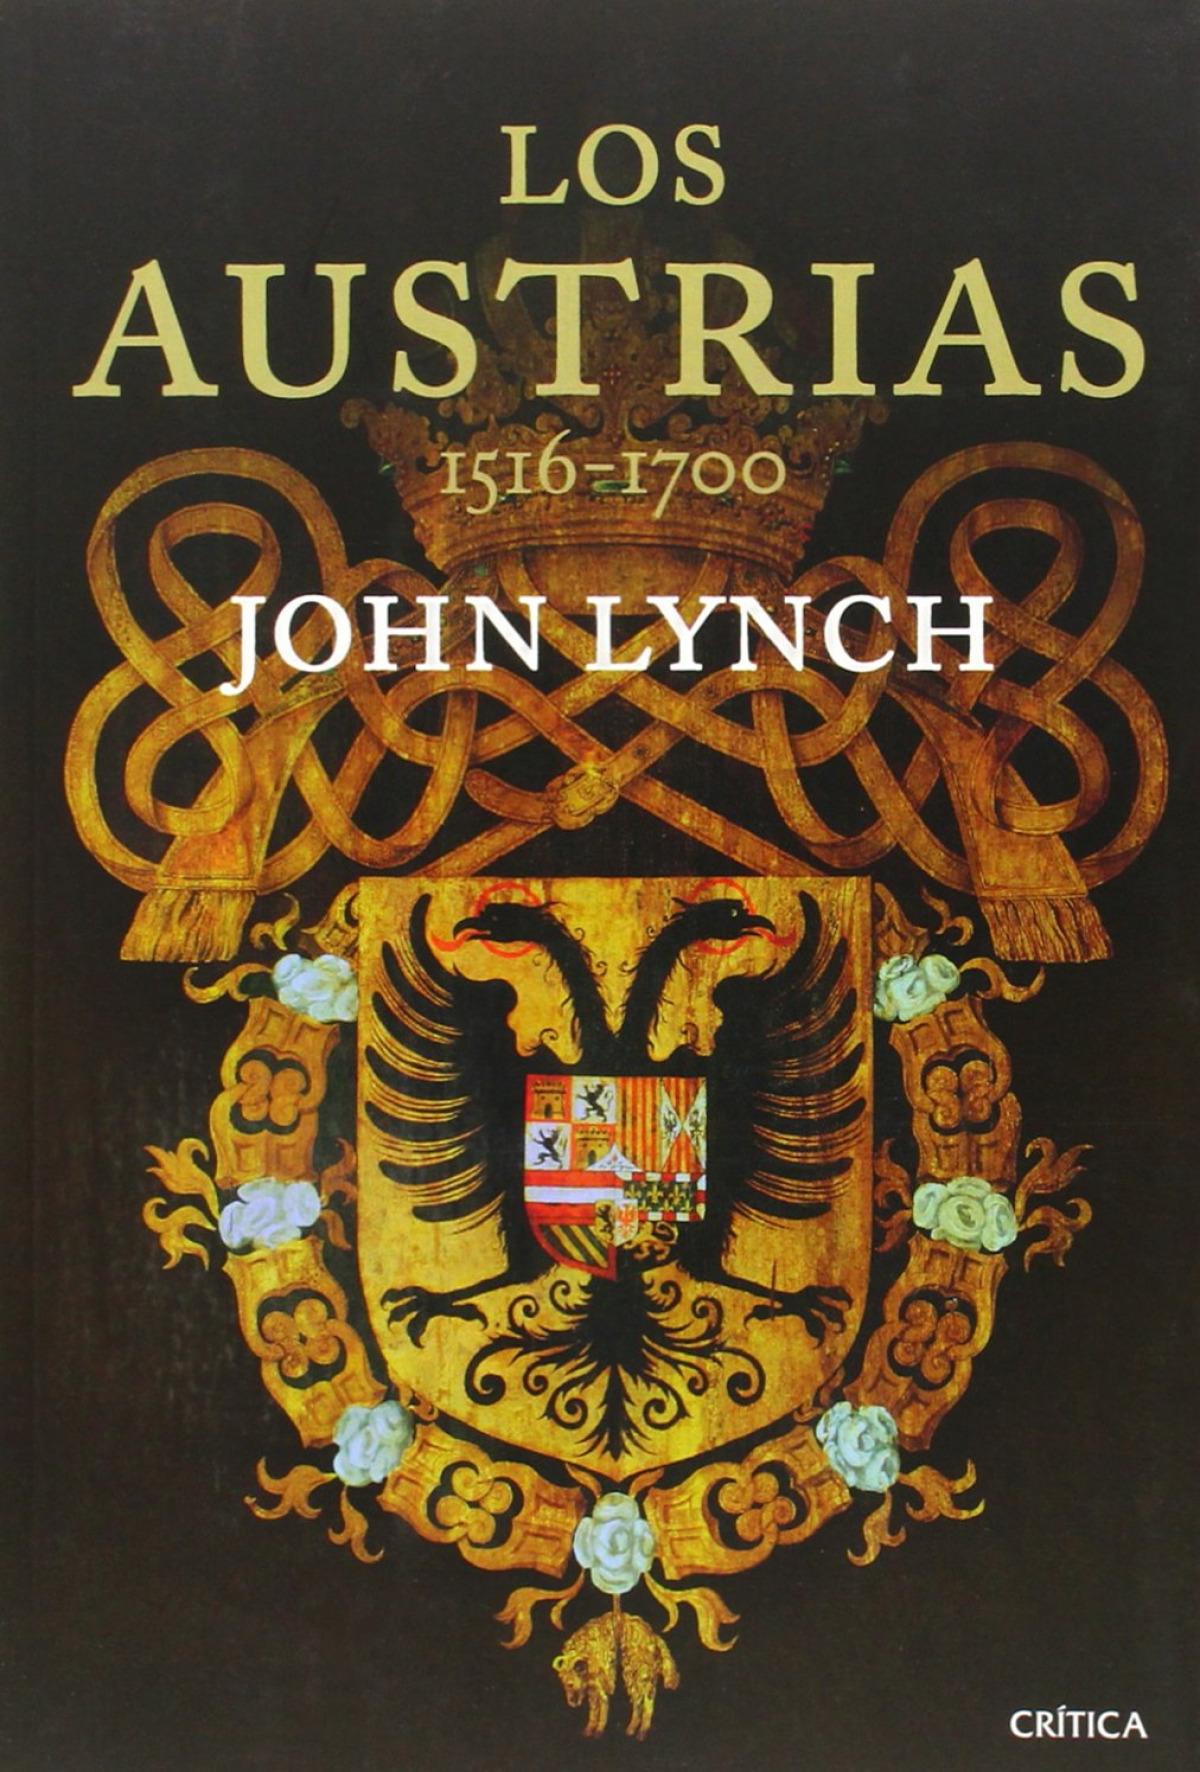 Los Austrias - John Lynch